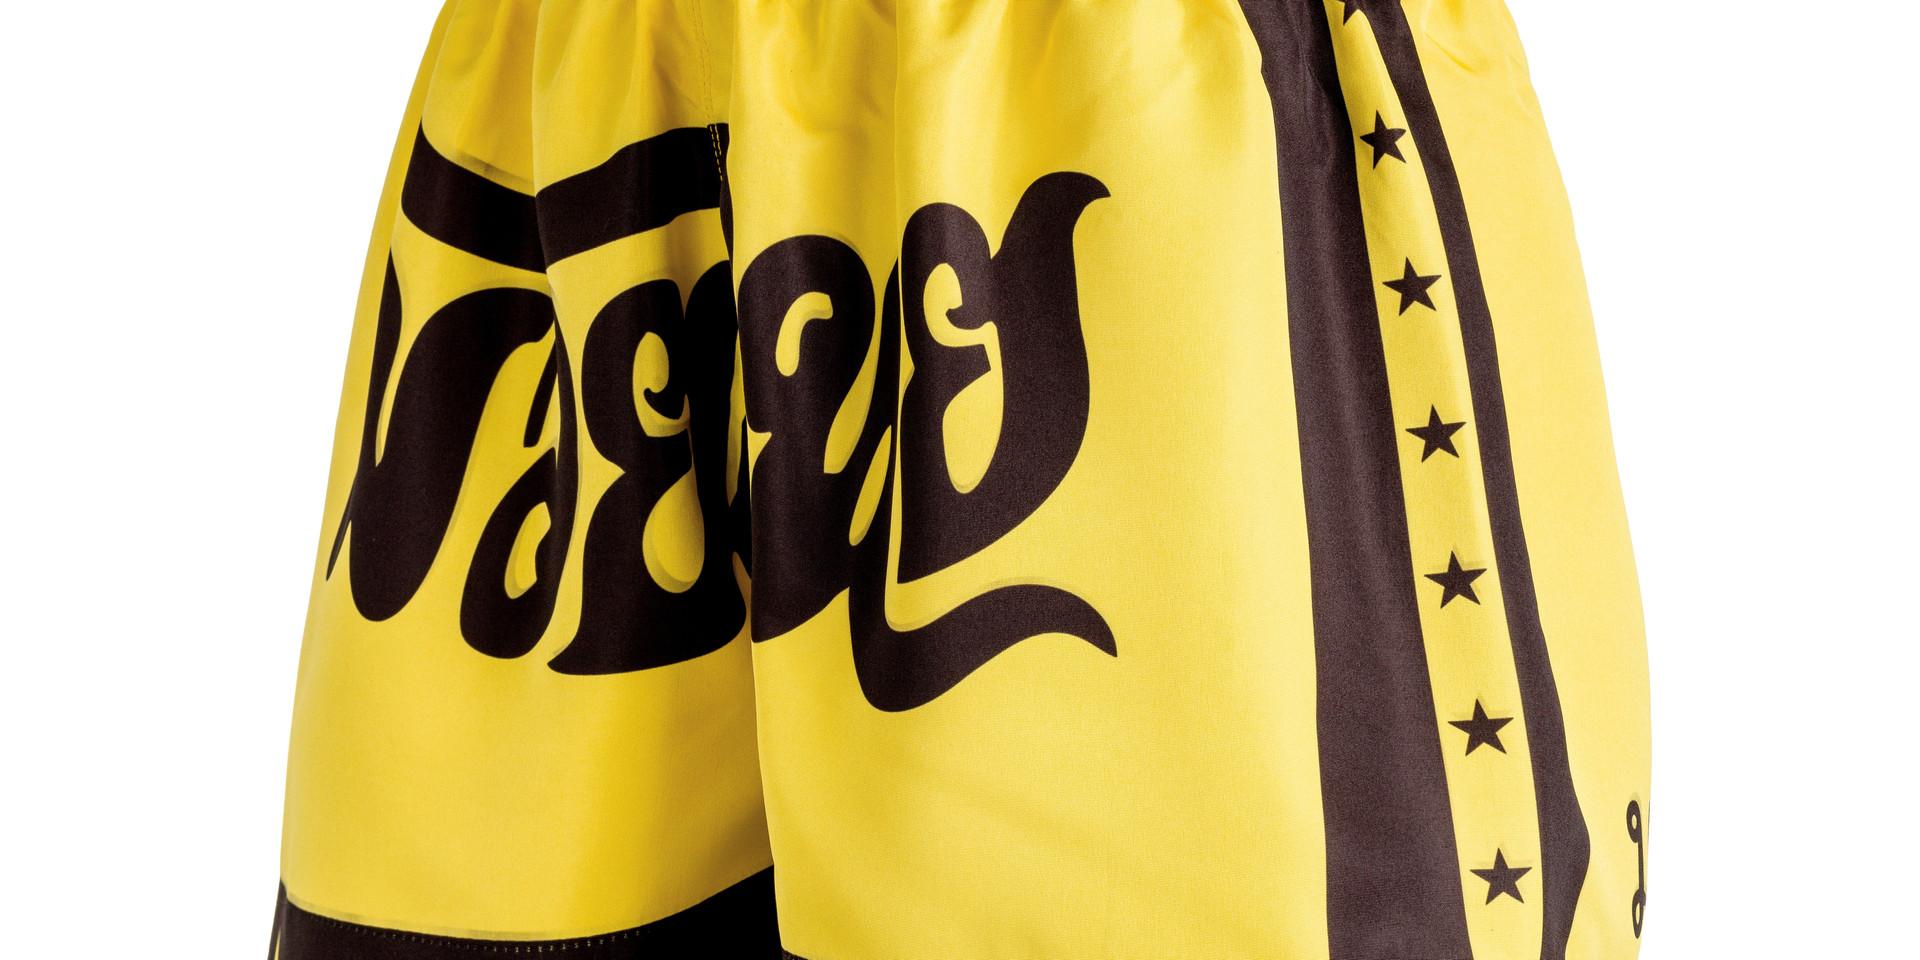 Shorts Fheras Estrela 2 Amarelo/Preto